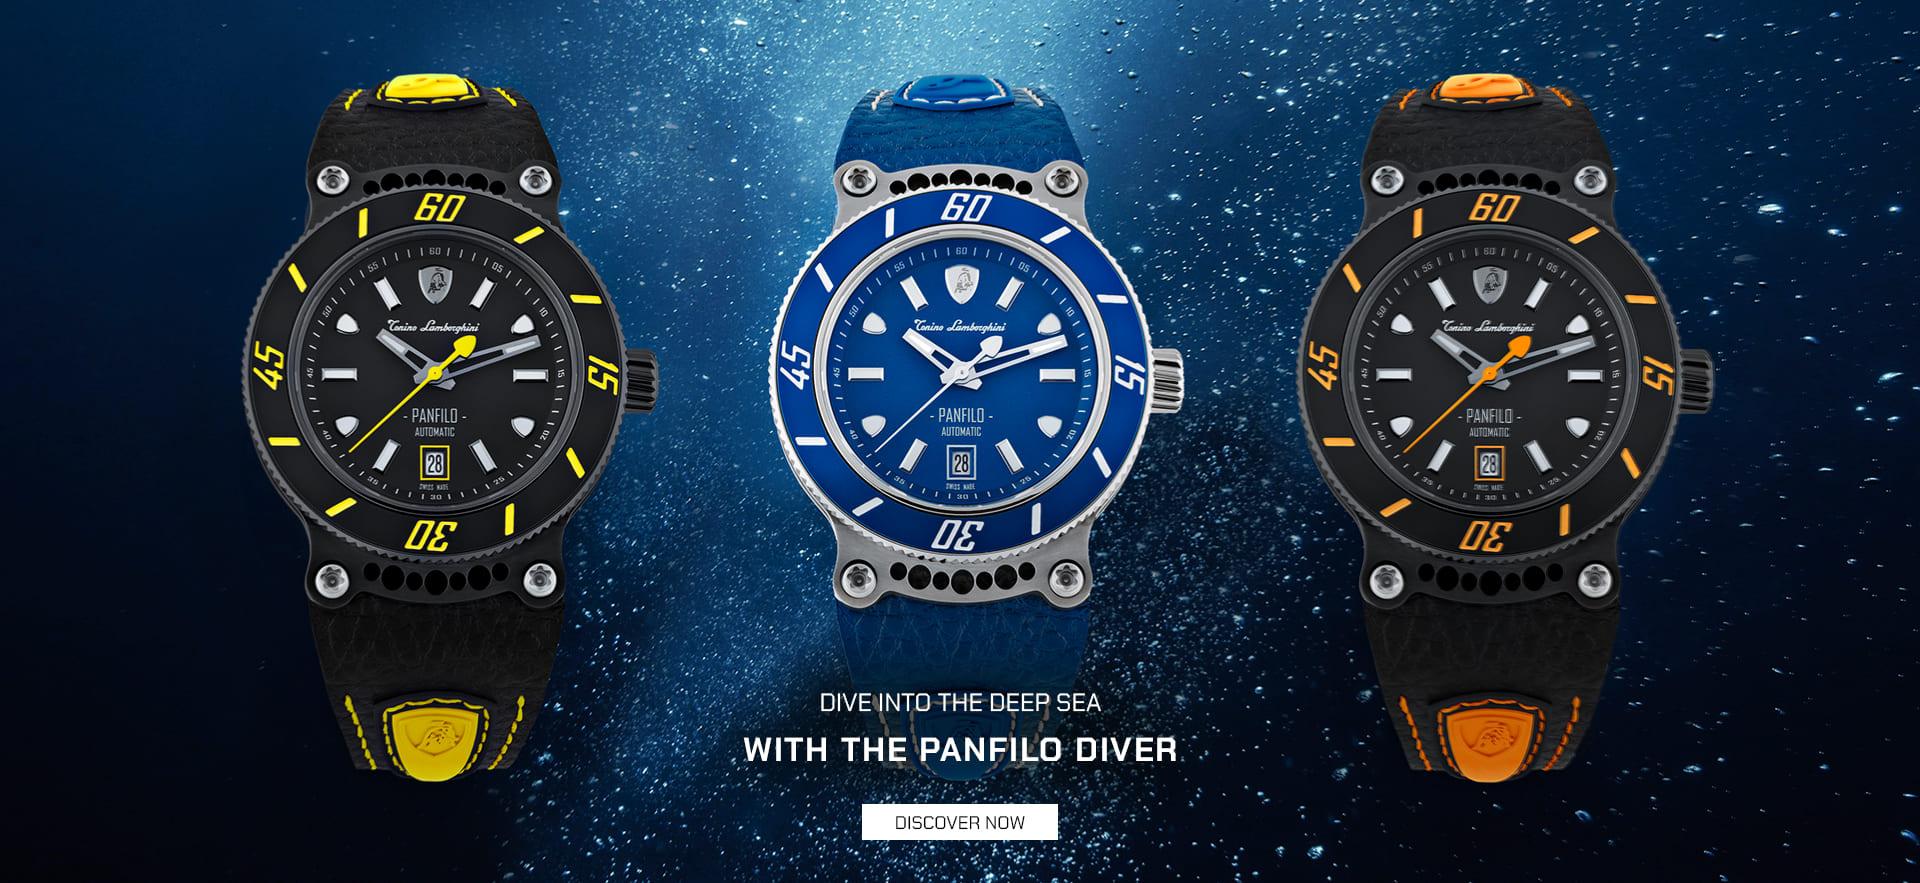 Tonino Lamborghini Panfilo Diver watches.